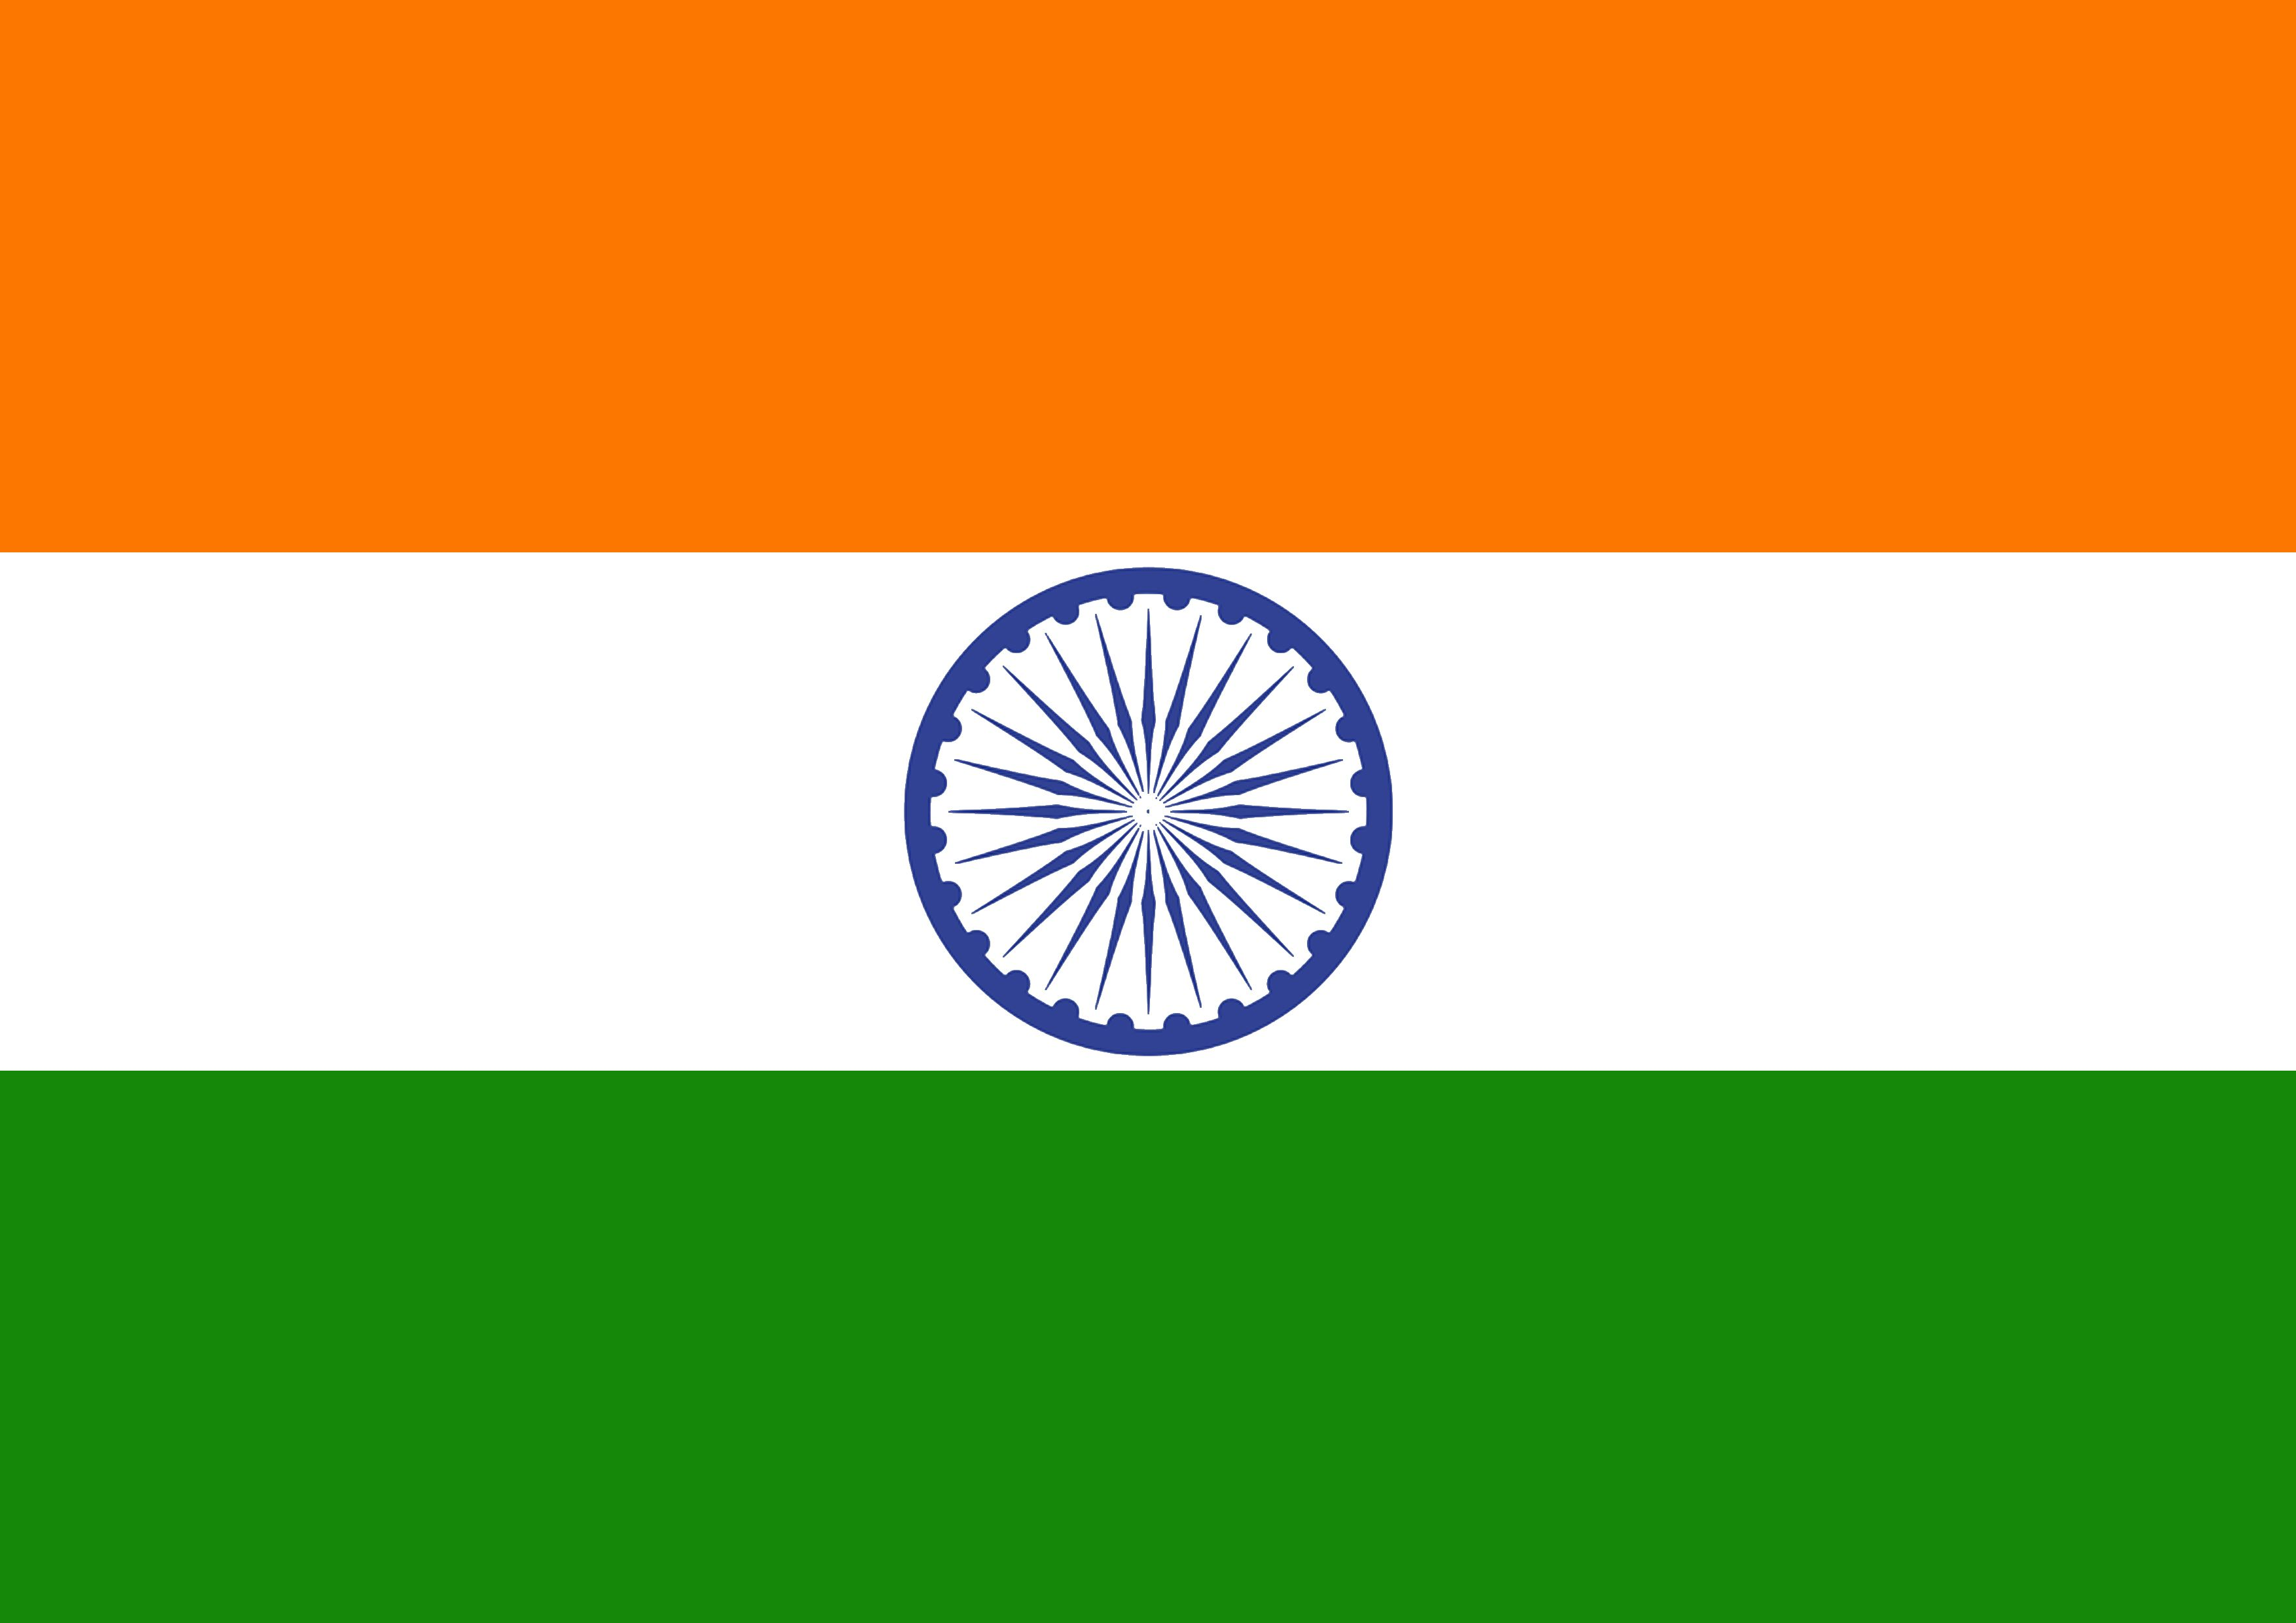 HappyIndependenceDayIndiaFlagFullHdWallpapers1